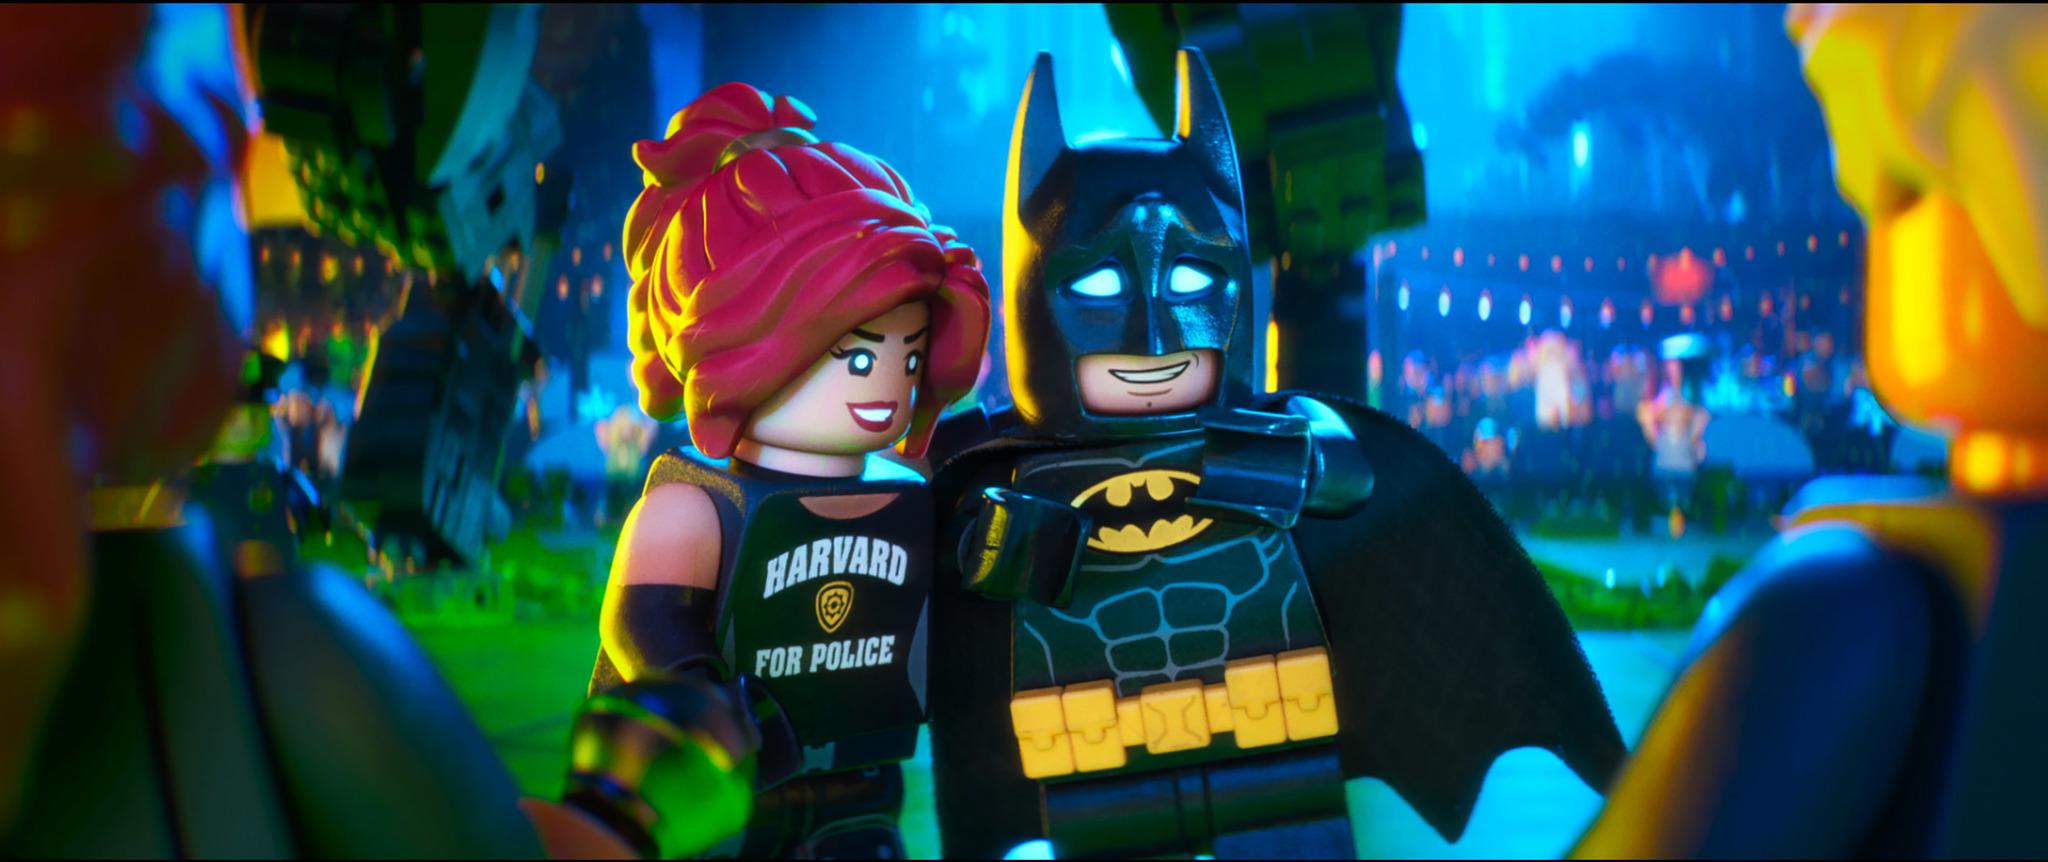 Will Arnett and Rosario Dawson in The Lego Batman Movie (2017)